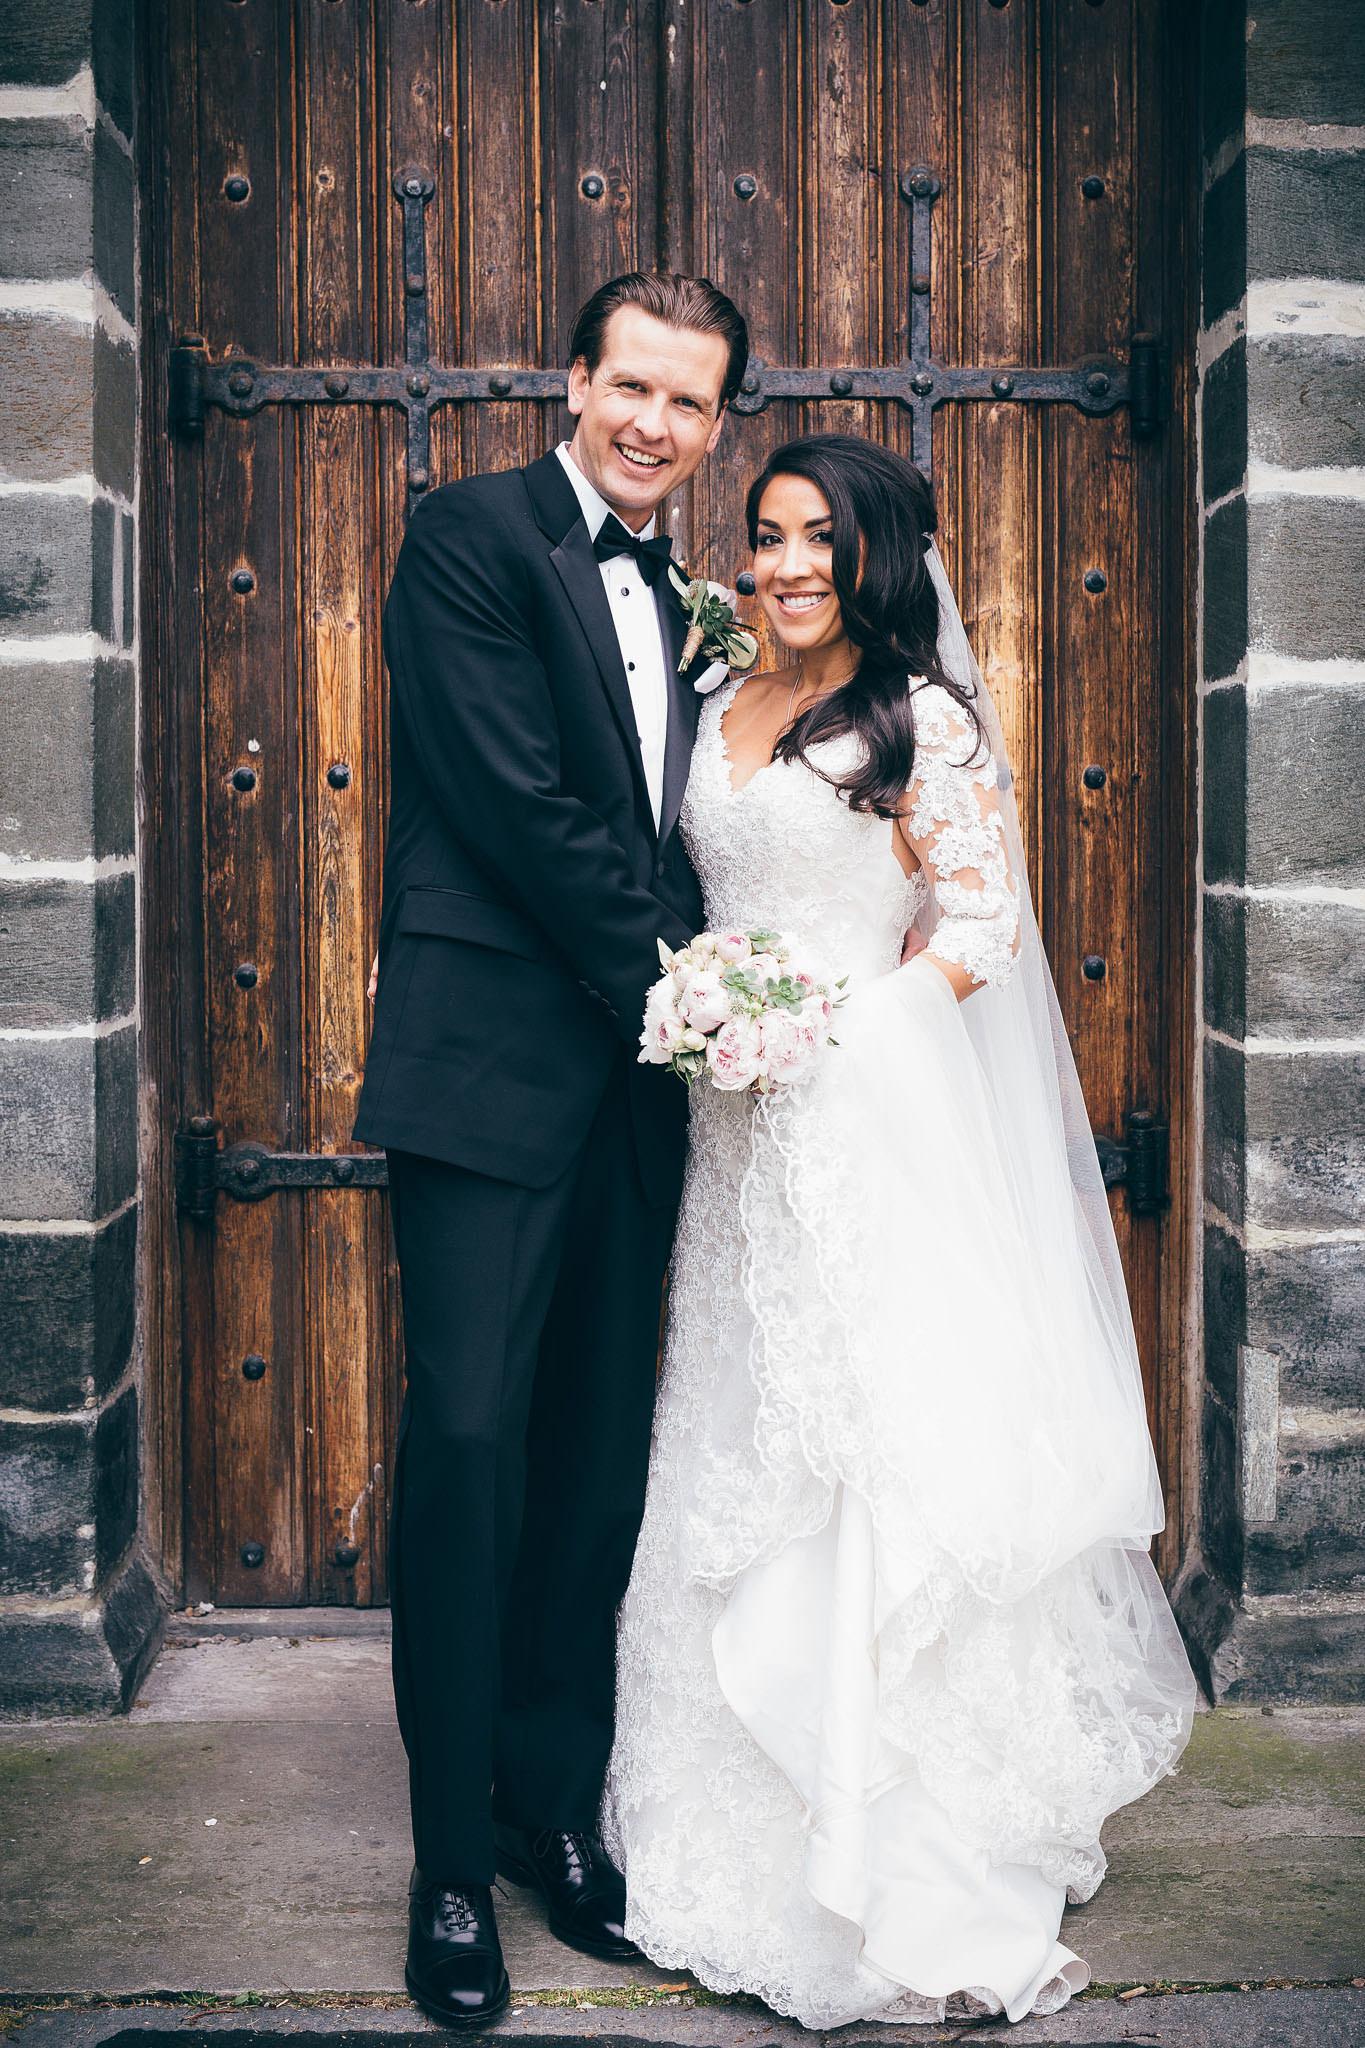 Wedding+Photographer+Norway+Bryllupsfotograf+Casey+Arneson+MK-146.jpg